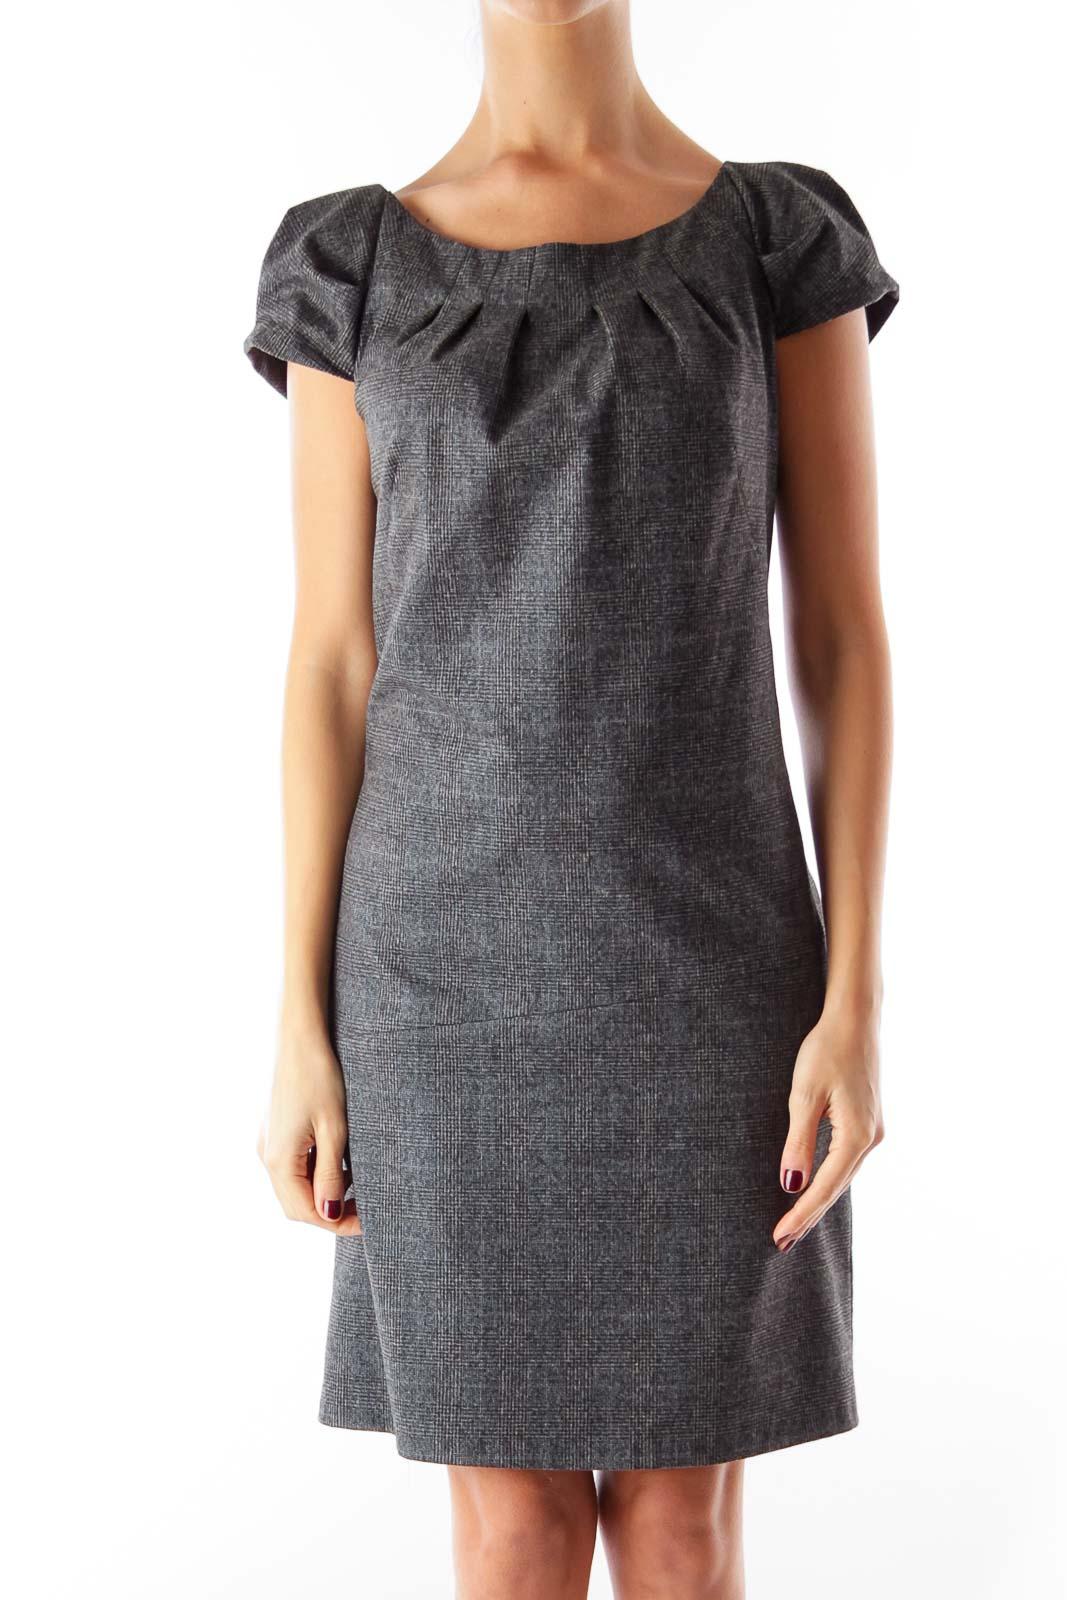 Dark Gray Plaid Dress Front